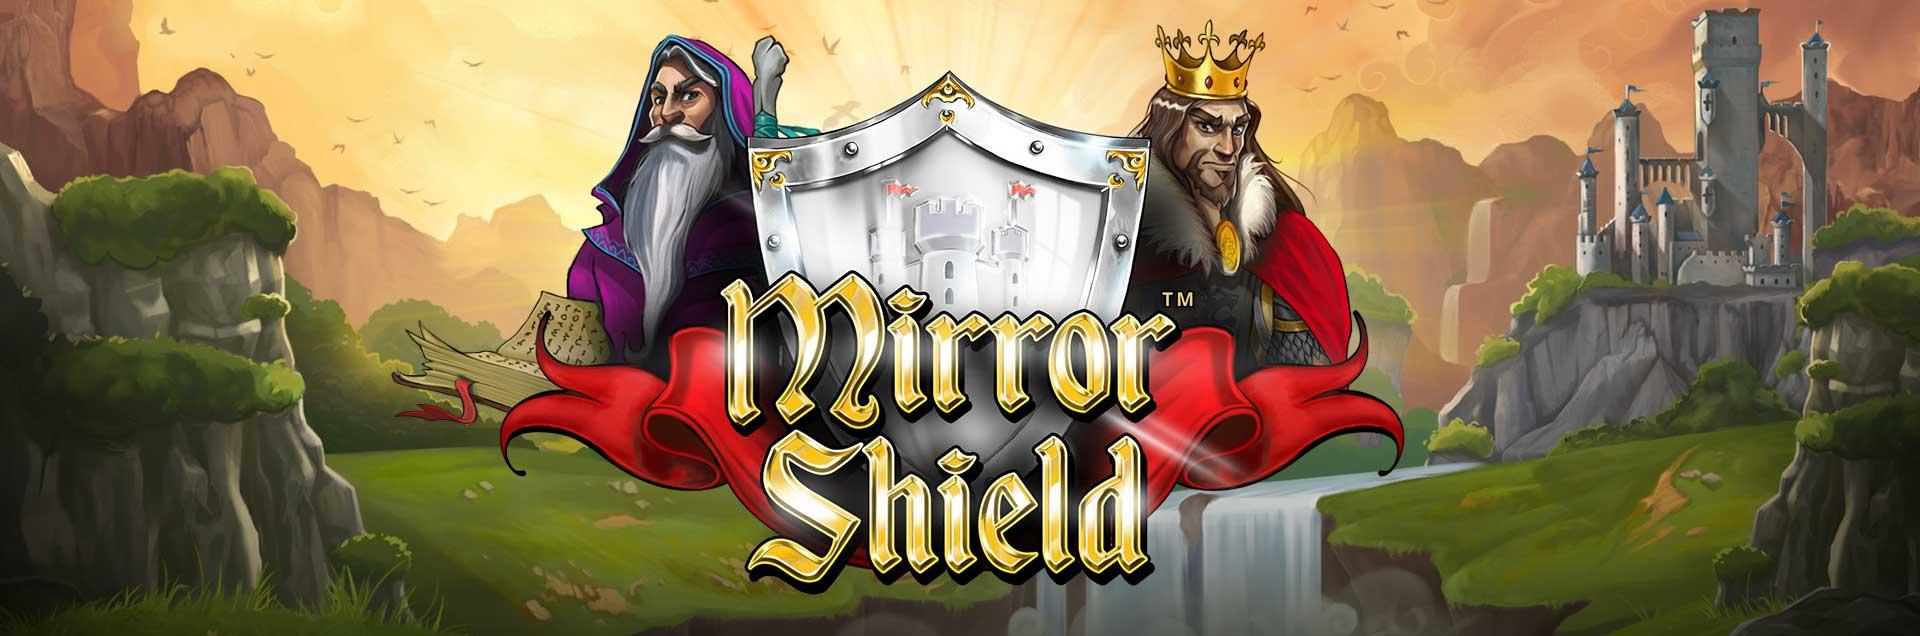 MirroShield1920x636